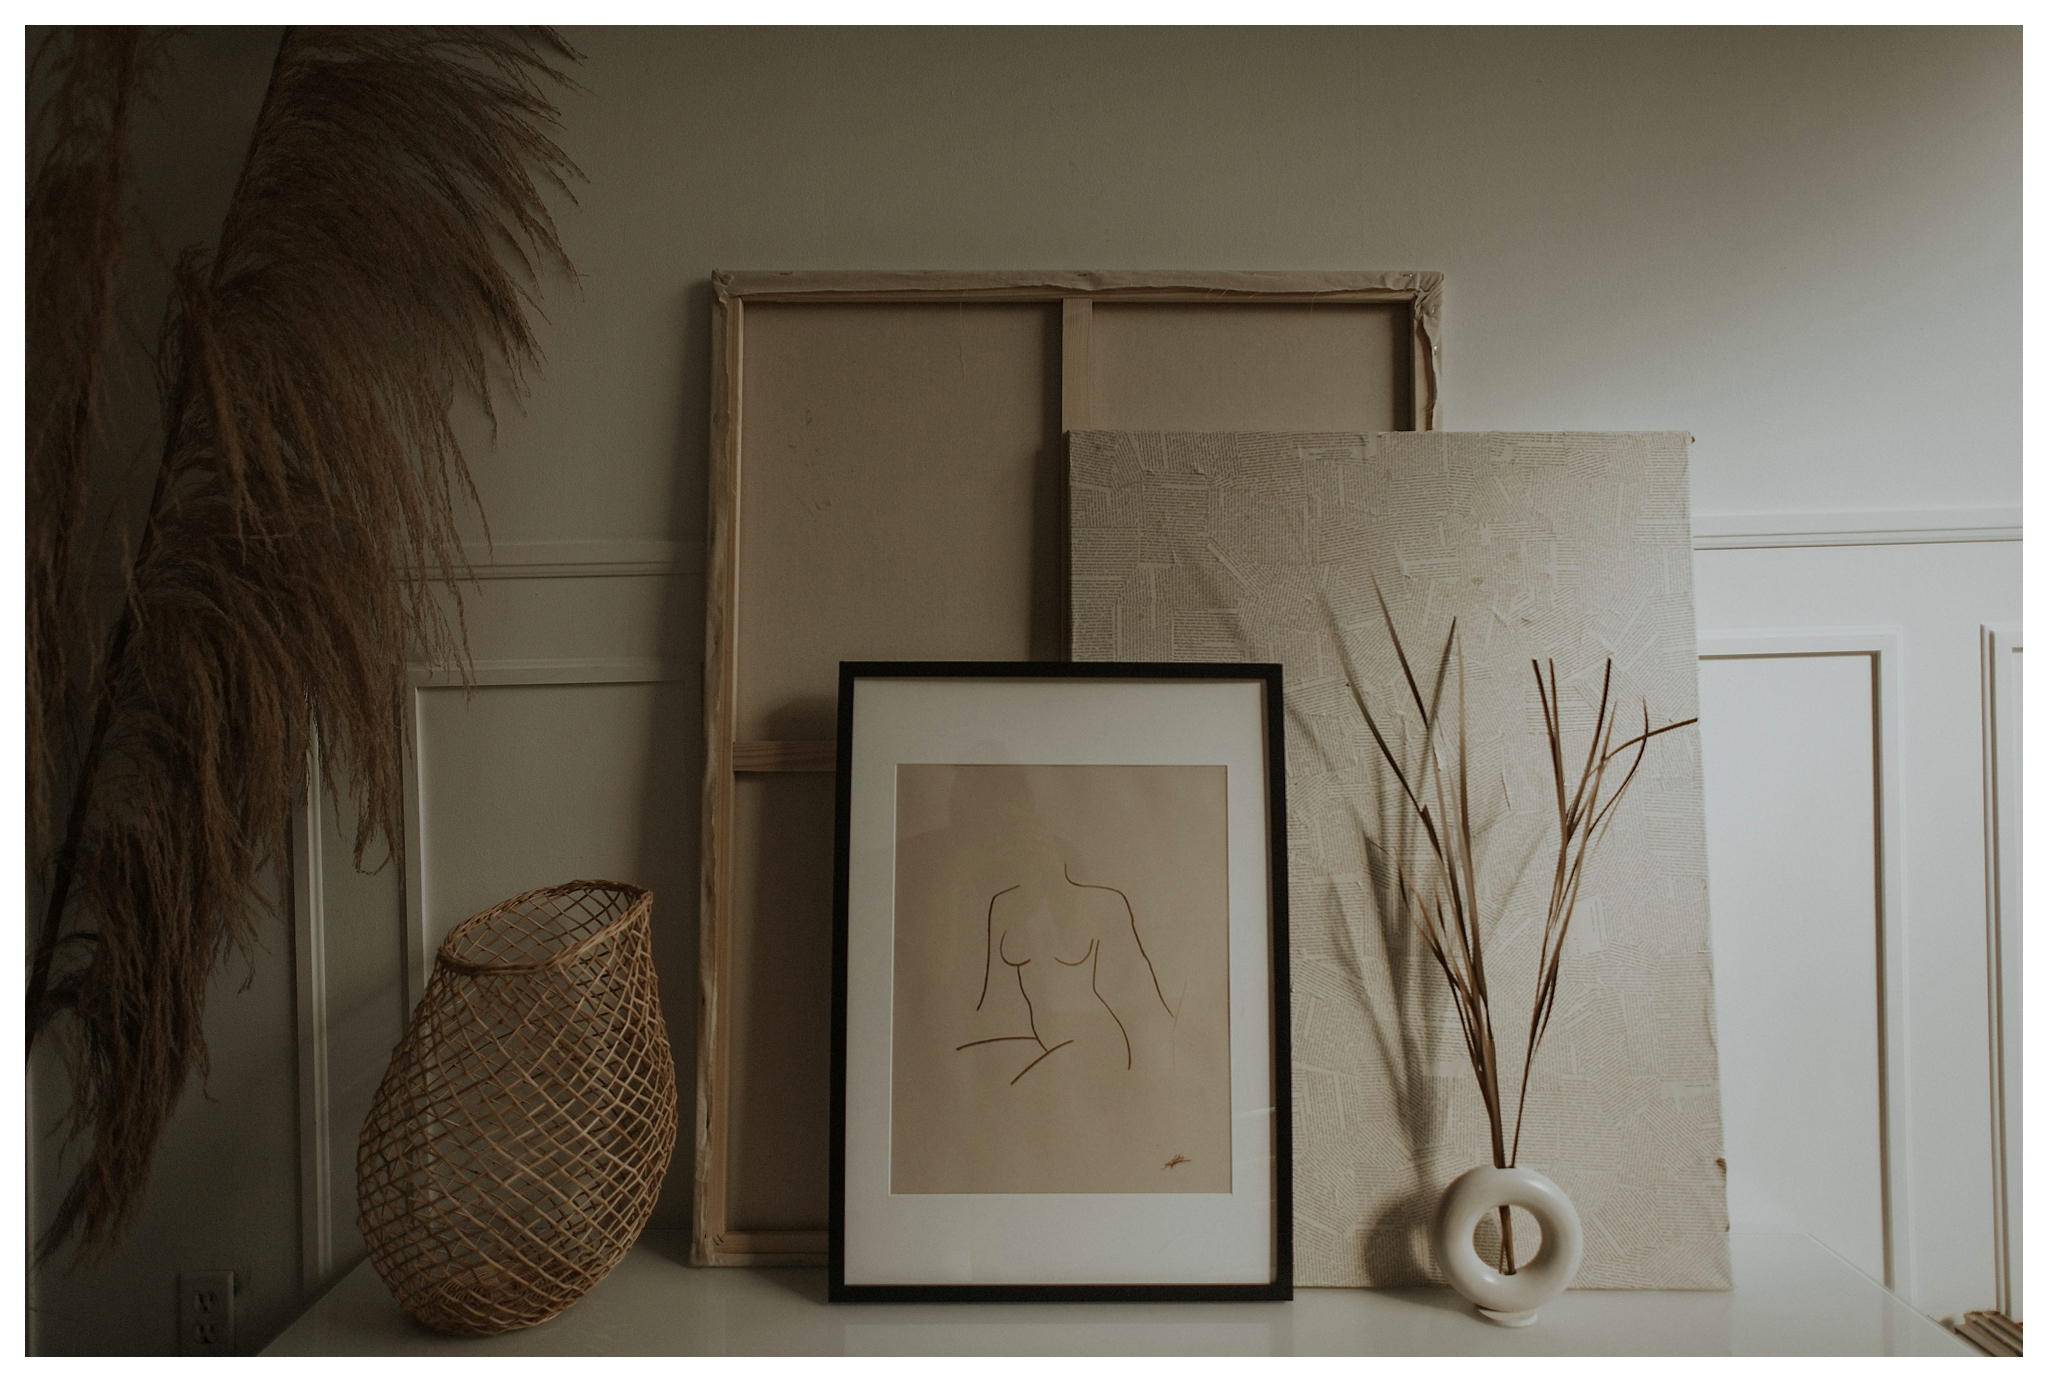 lovt studio east bows and lavender photography toronto loft photos